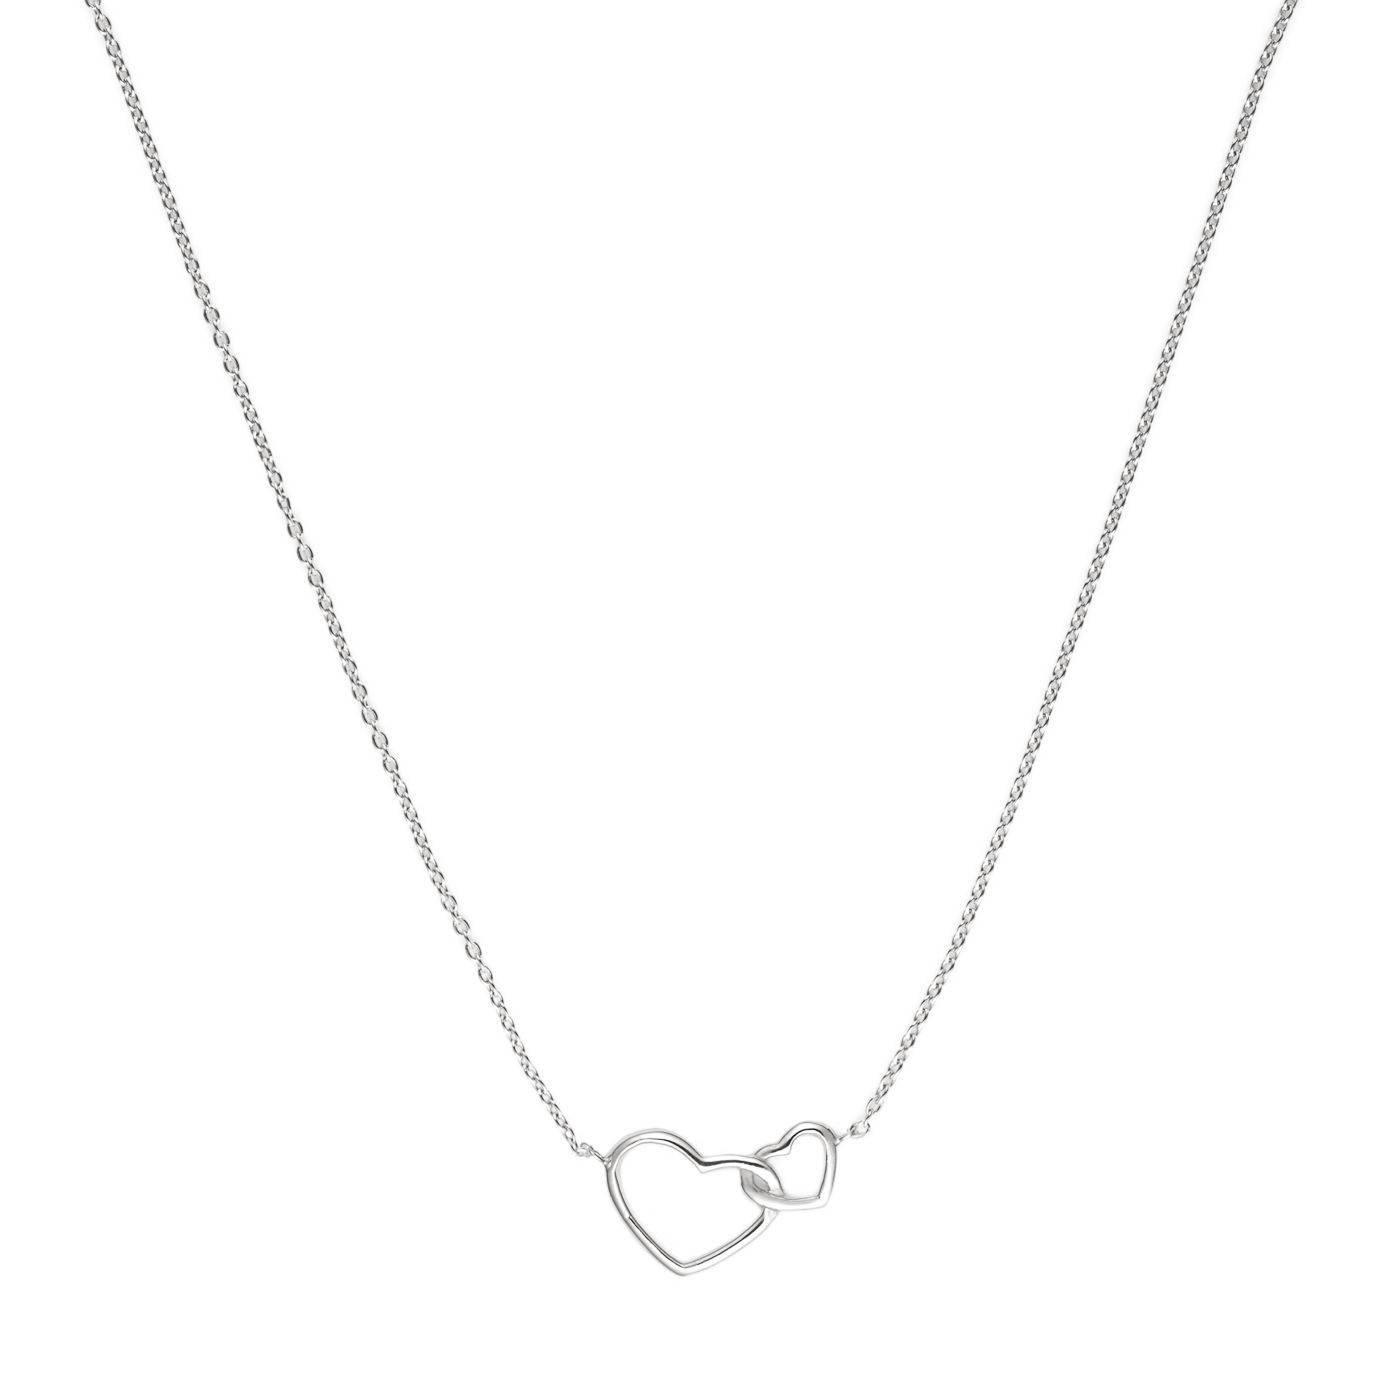 Lynn Manou 925 sterling silver necklace